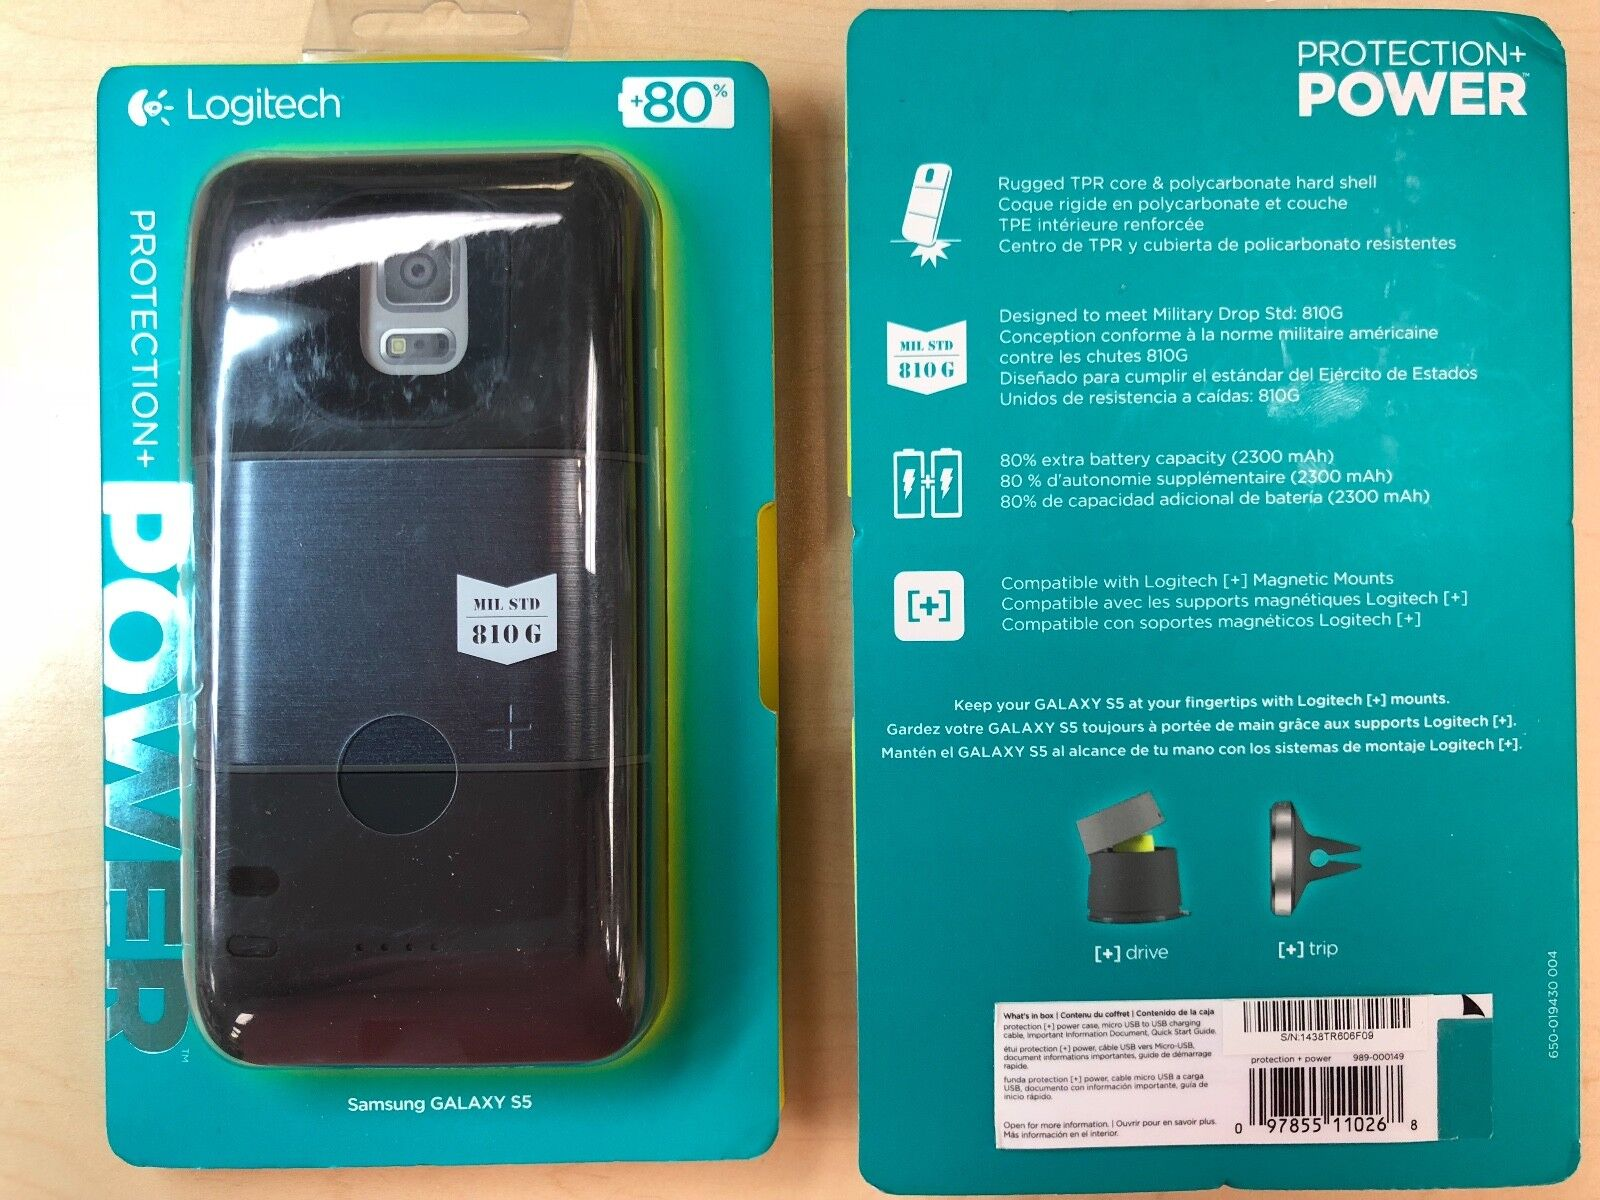 Logitech - Protection  Power External Battery Case For Samsu